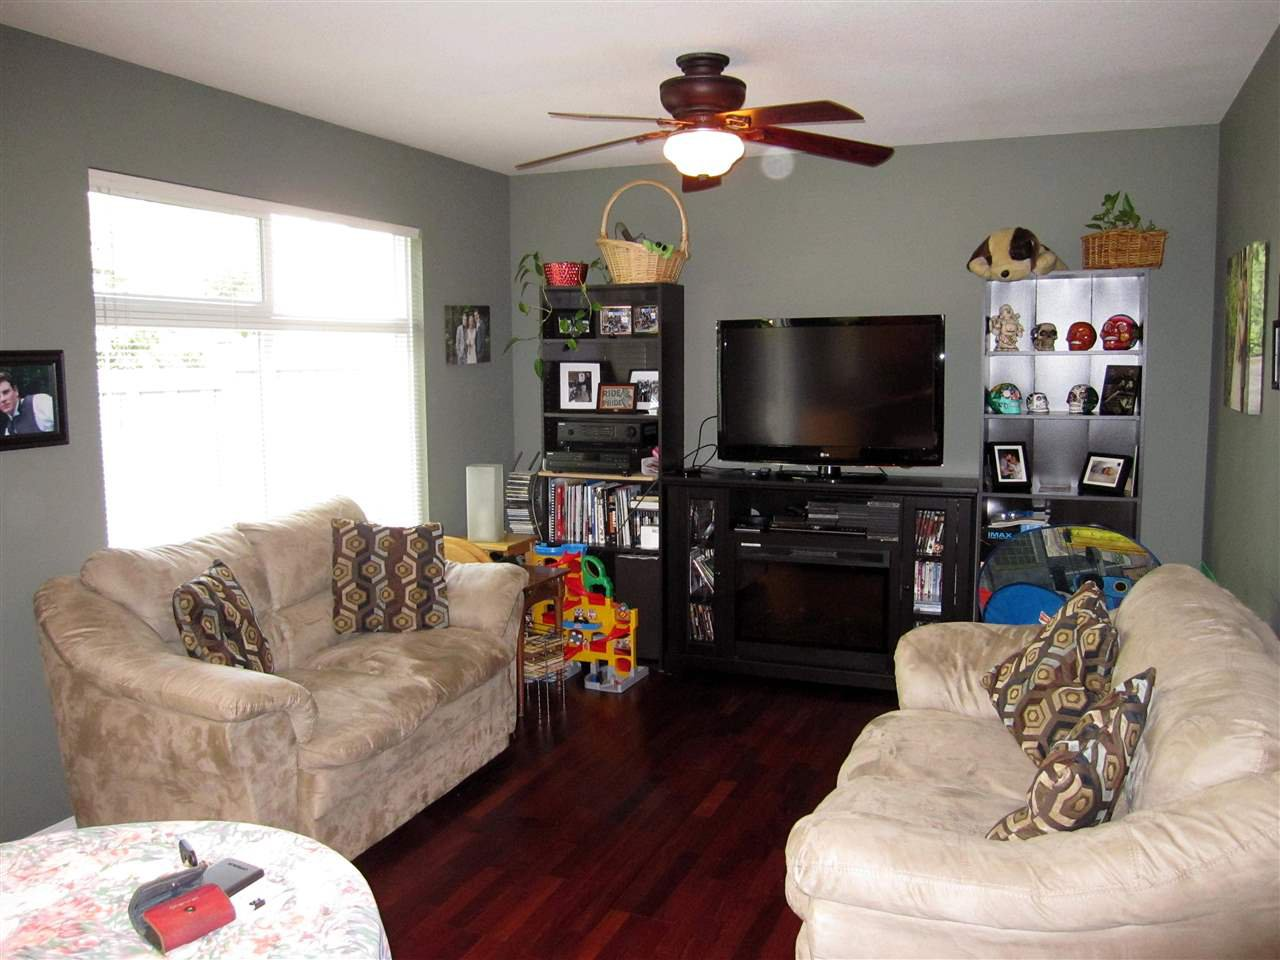 "Photo 6: Photos: 14 23343 KANAKA Way in Maple Ridge: Cottonwood MR Townhouse for sale in ""COTTONWOOD GROVE"" : MLS®# R2164779"